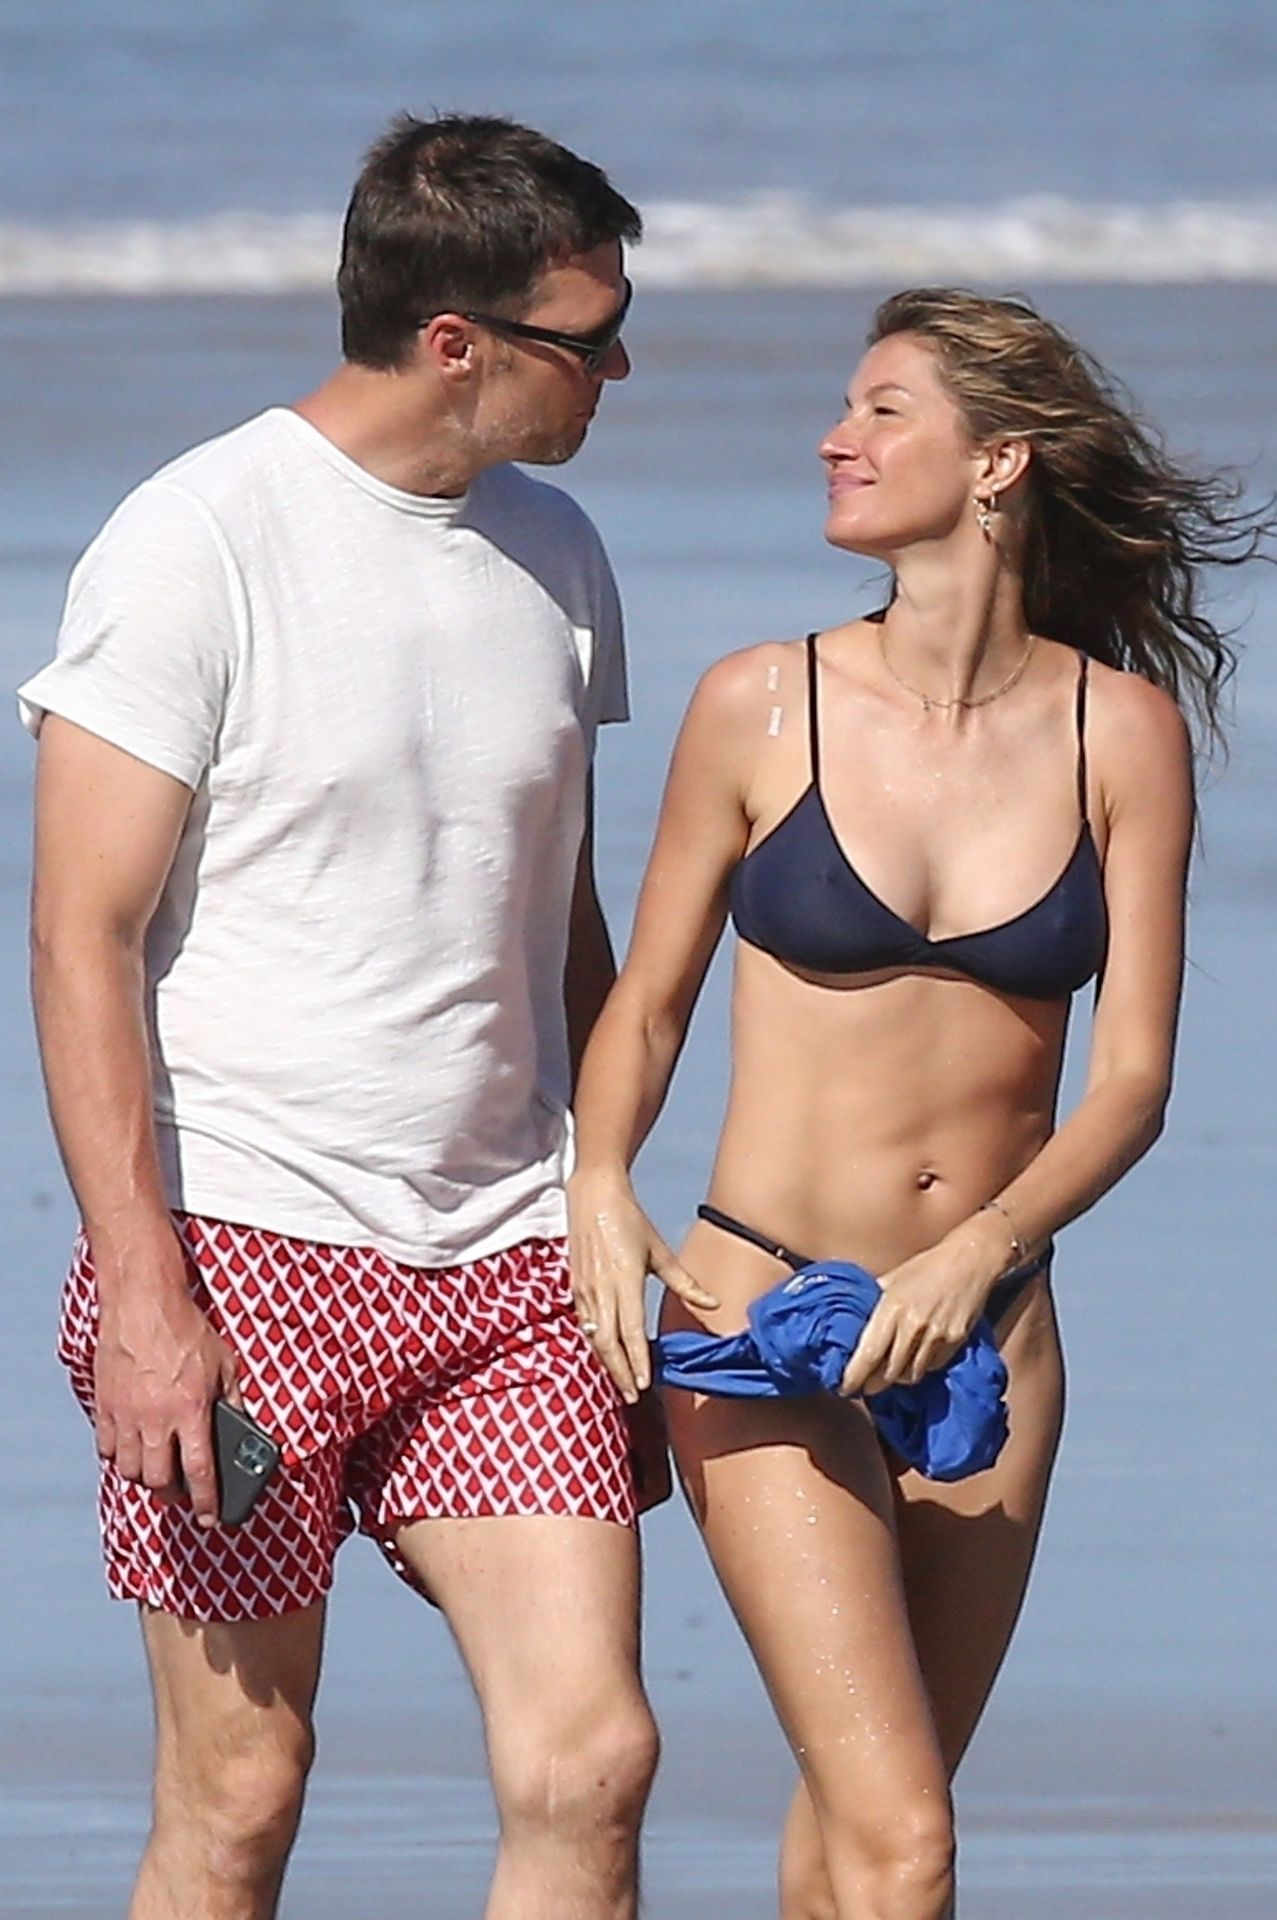 Tom Brady & Gisele Bundchen Pack On The Pda At The Beach 0031